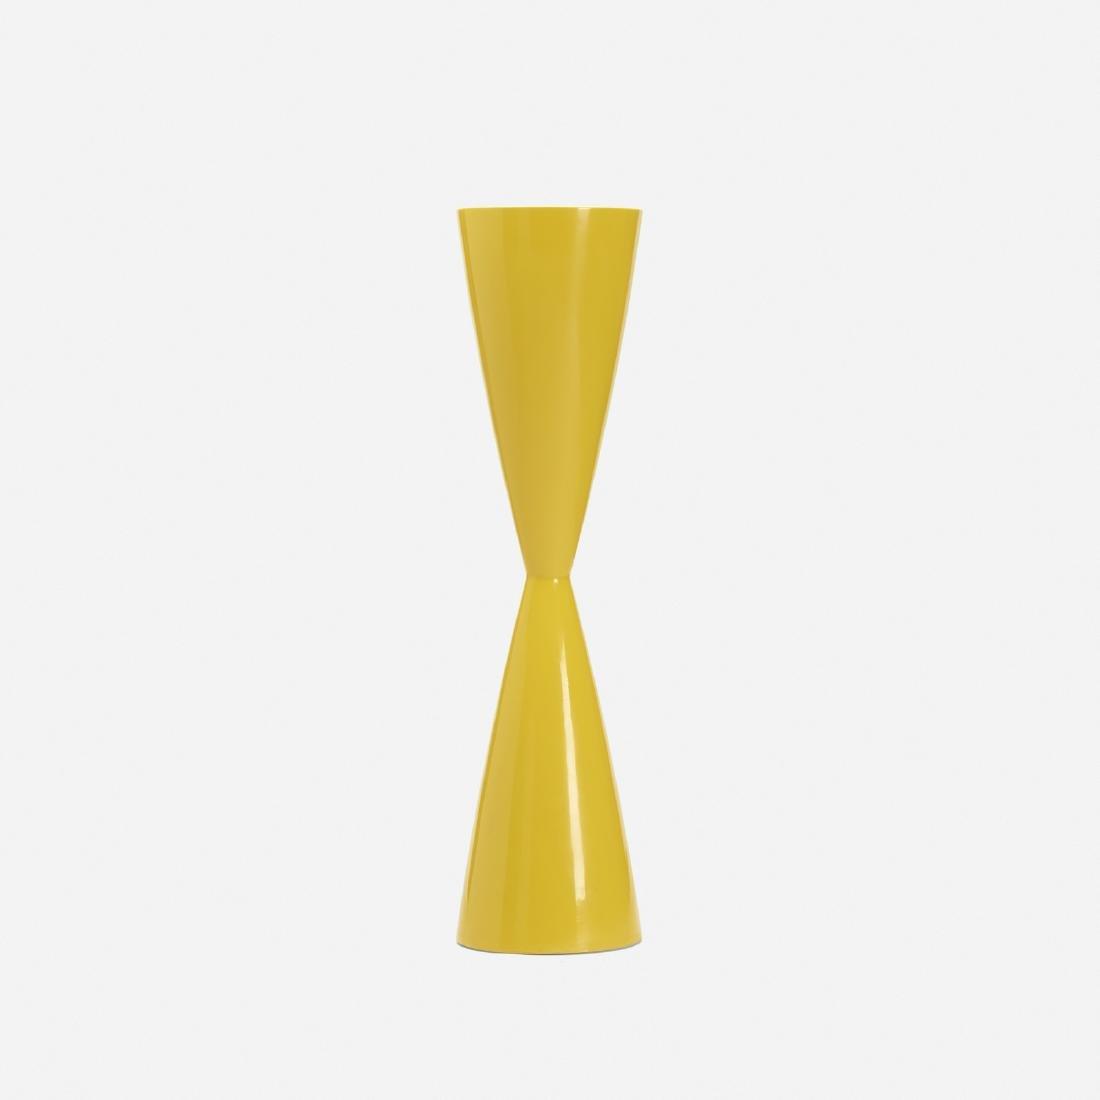 De Wain Valentine, Double Cone Yellow